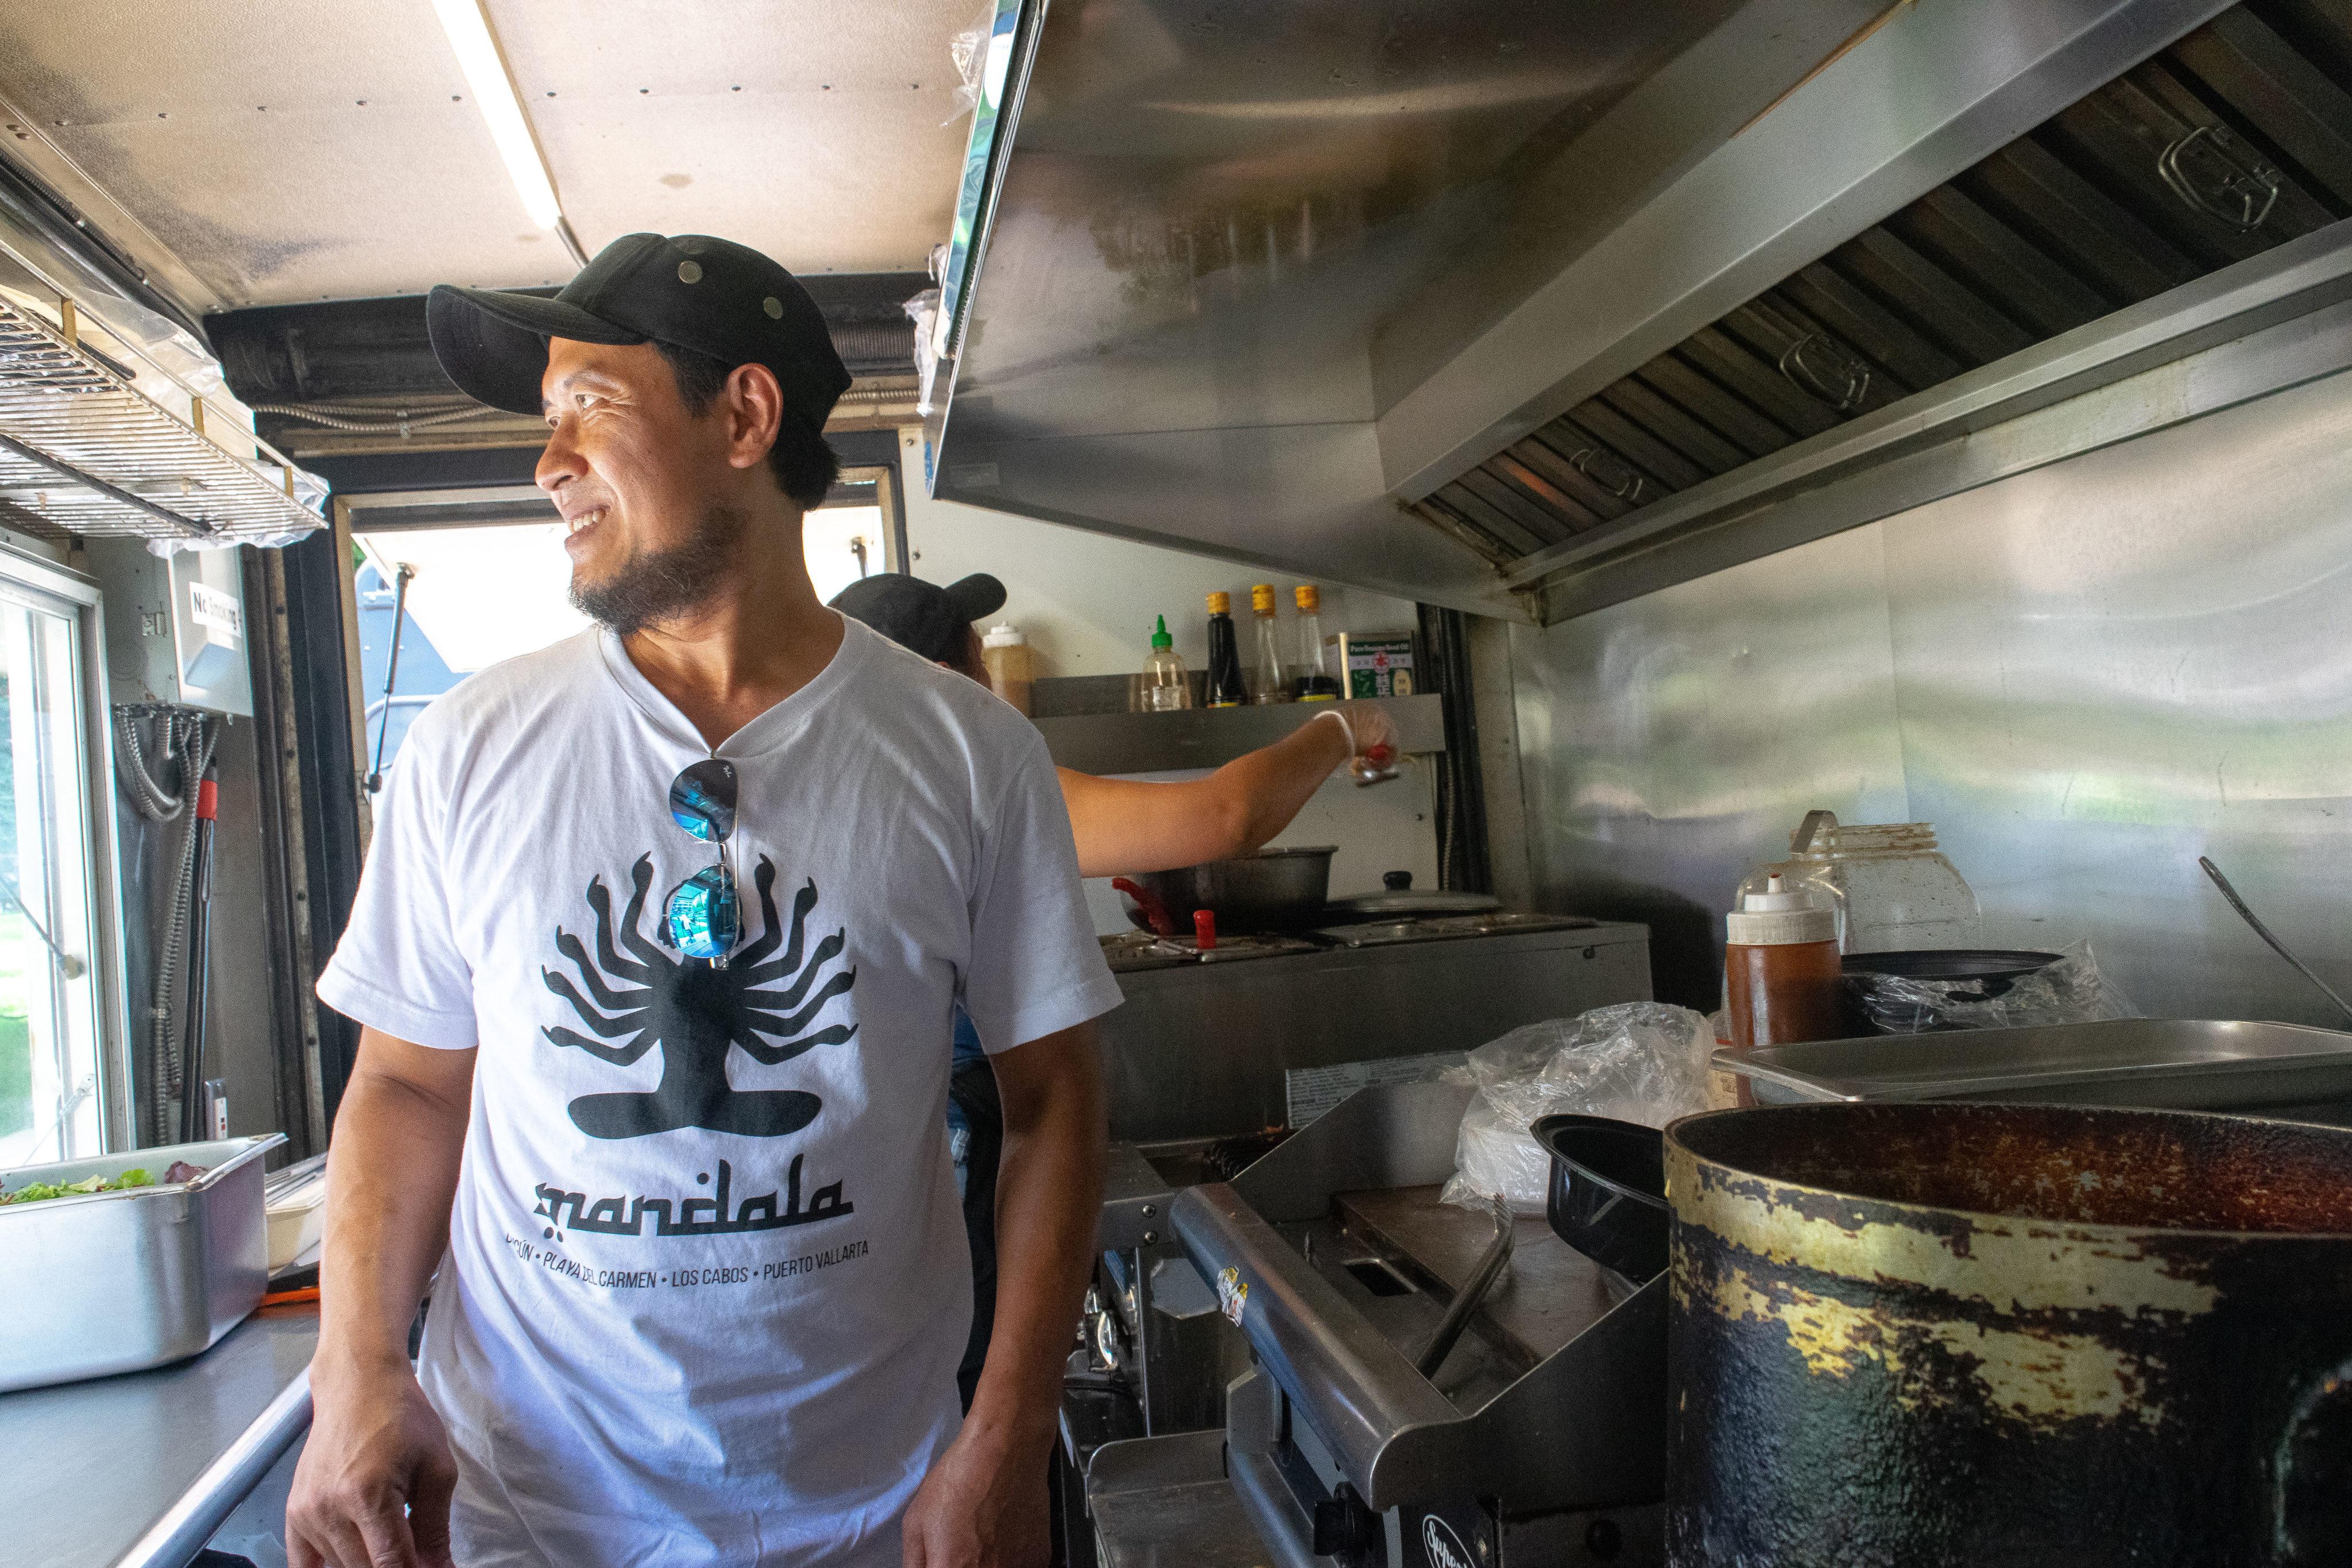 Food trucks drive DC's food scene forward